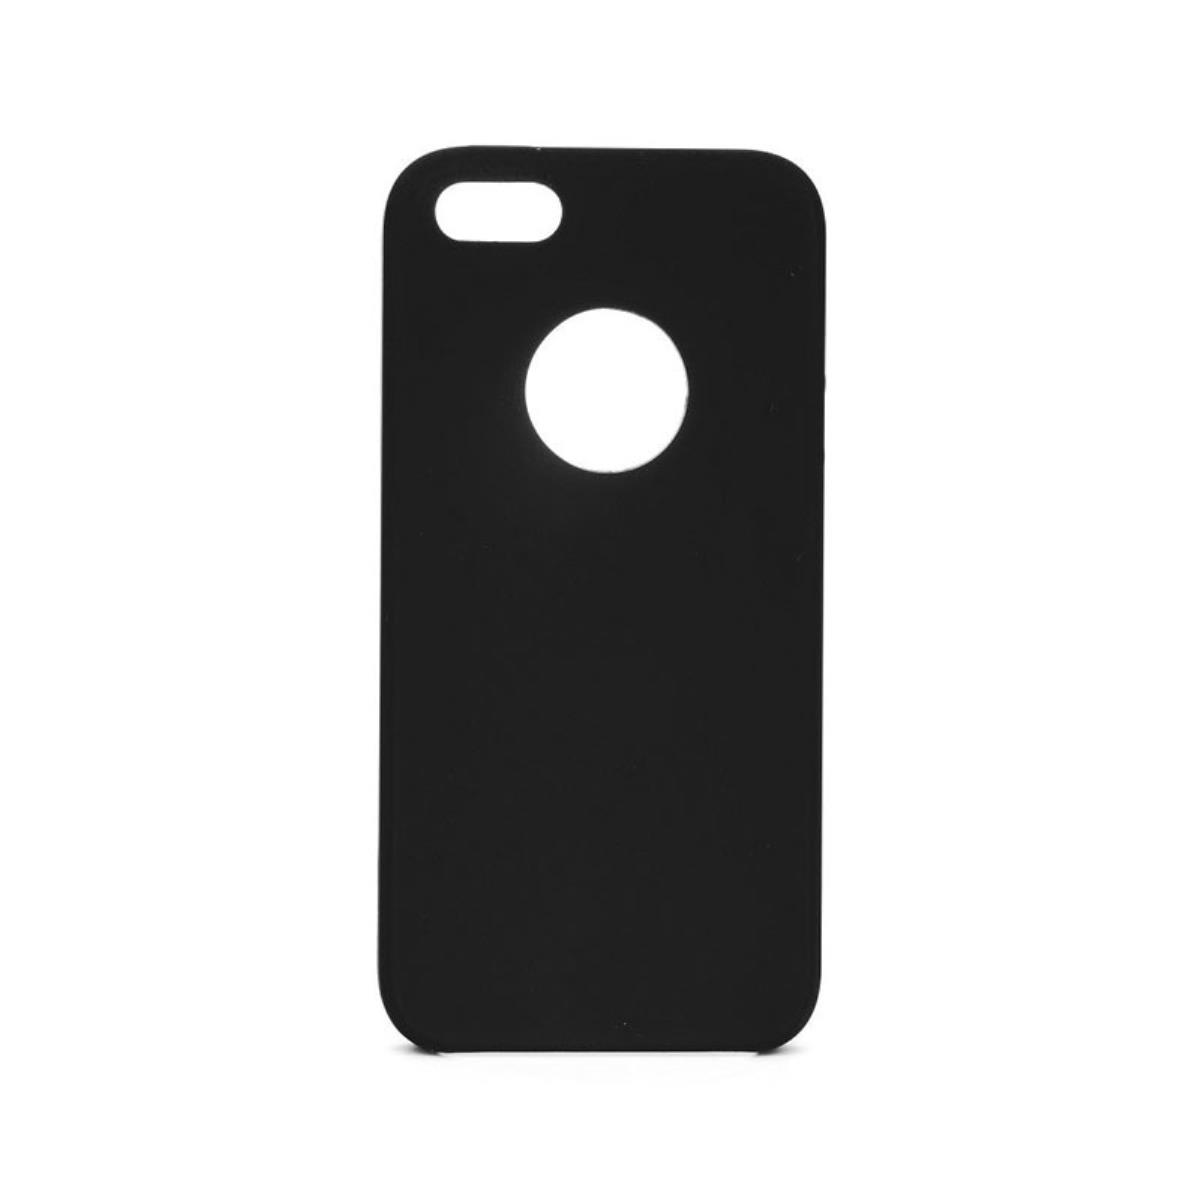 7ee527efb24 Compre online Funda Silicona Premium iPhone 5S/SE Negro